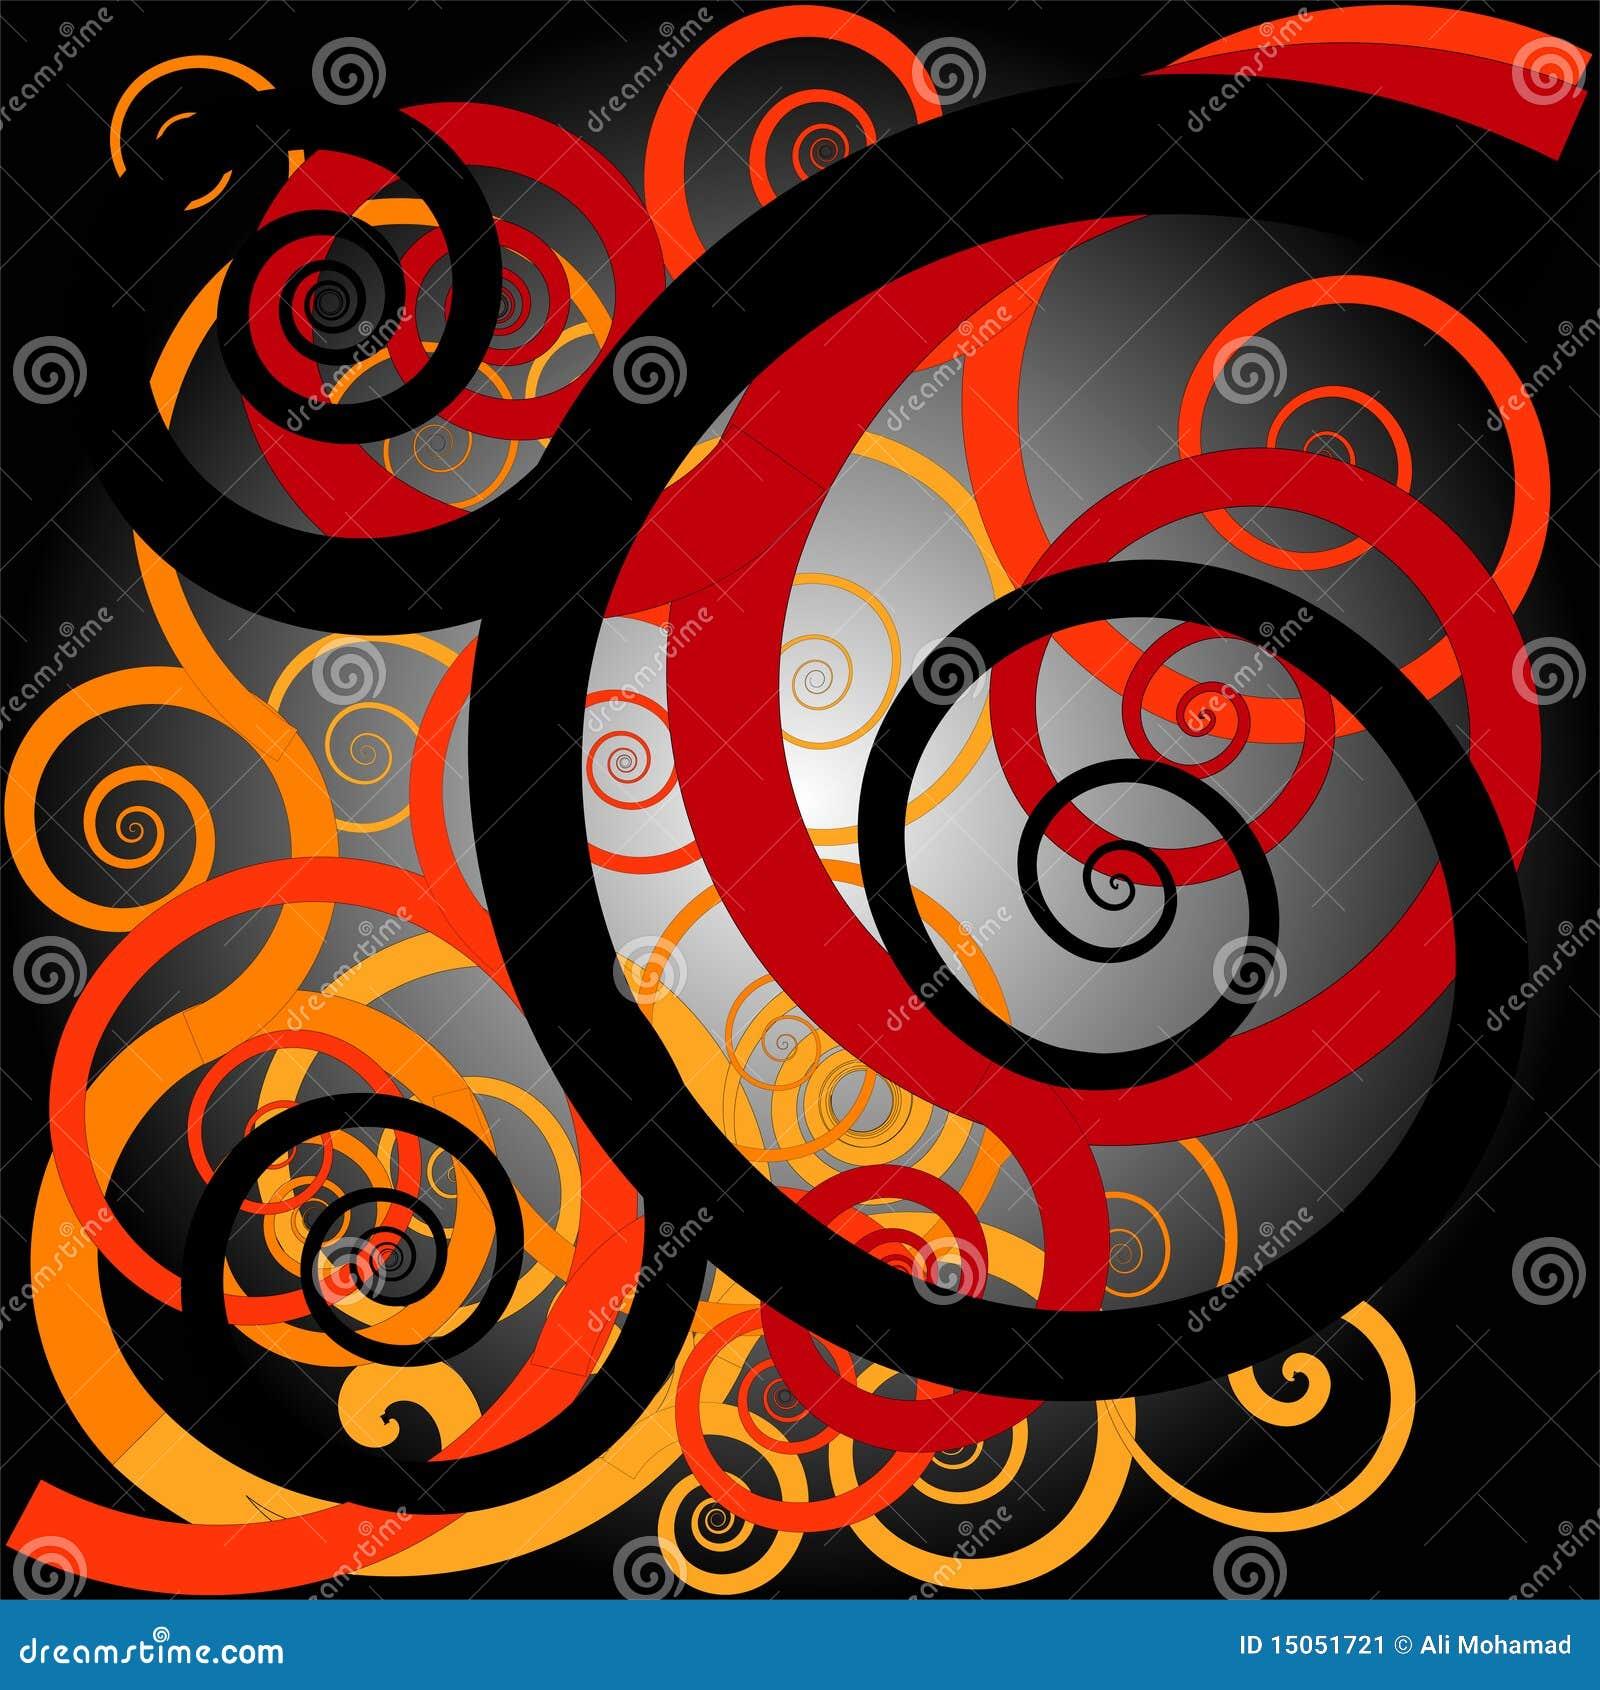 Orang Ulu Motif Design Stock Illustration Illustration Of